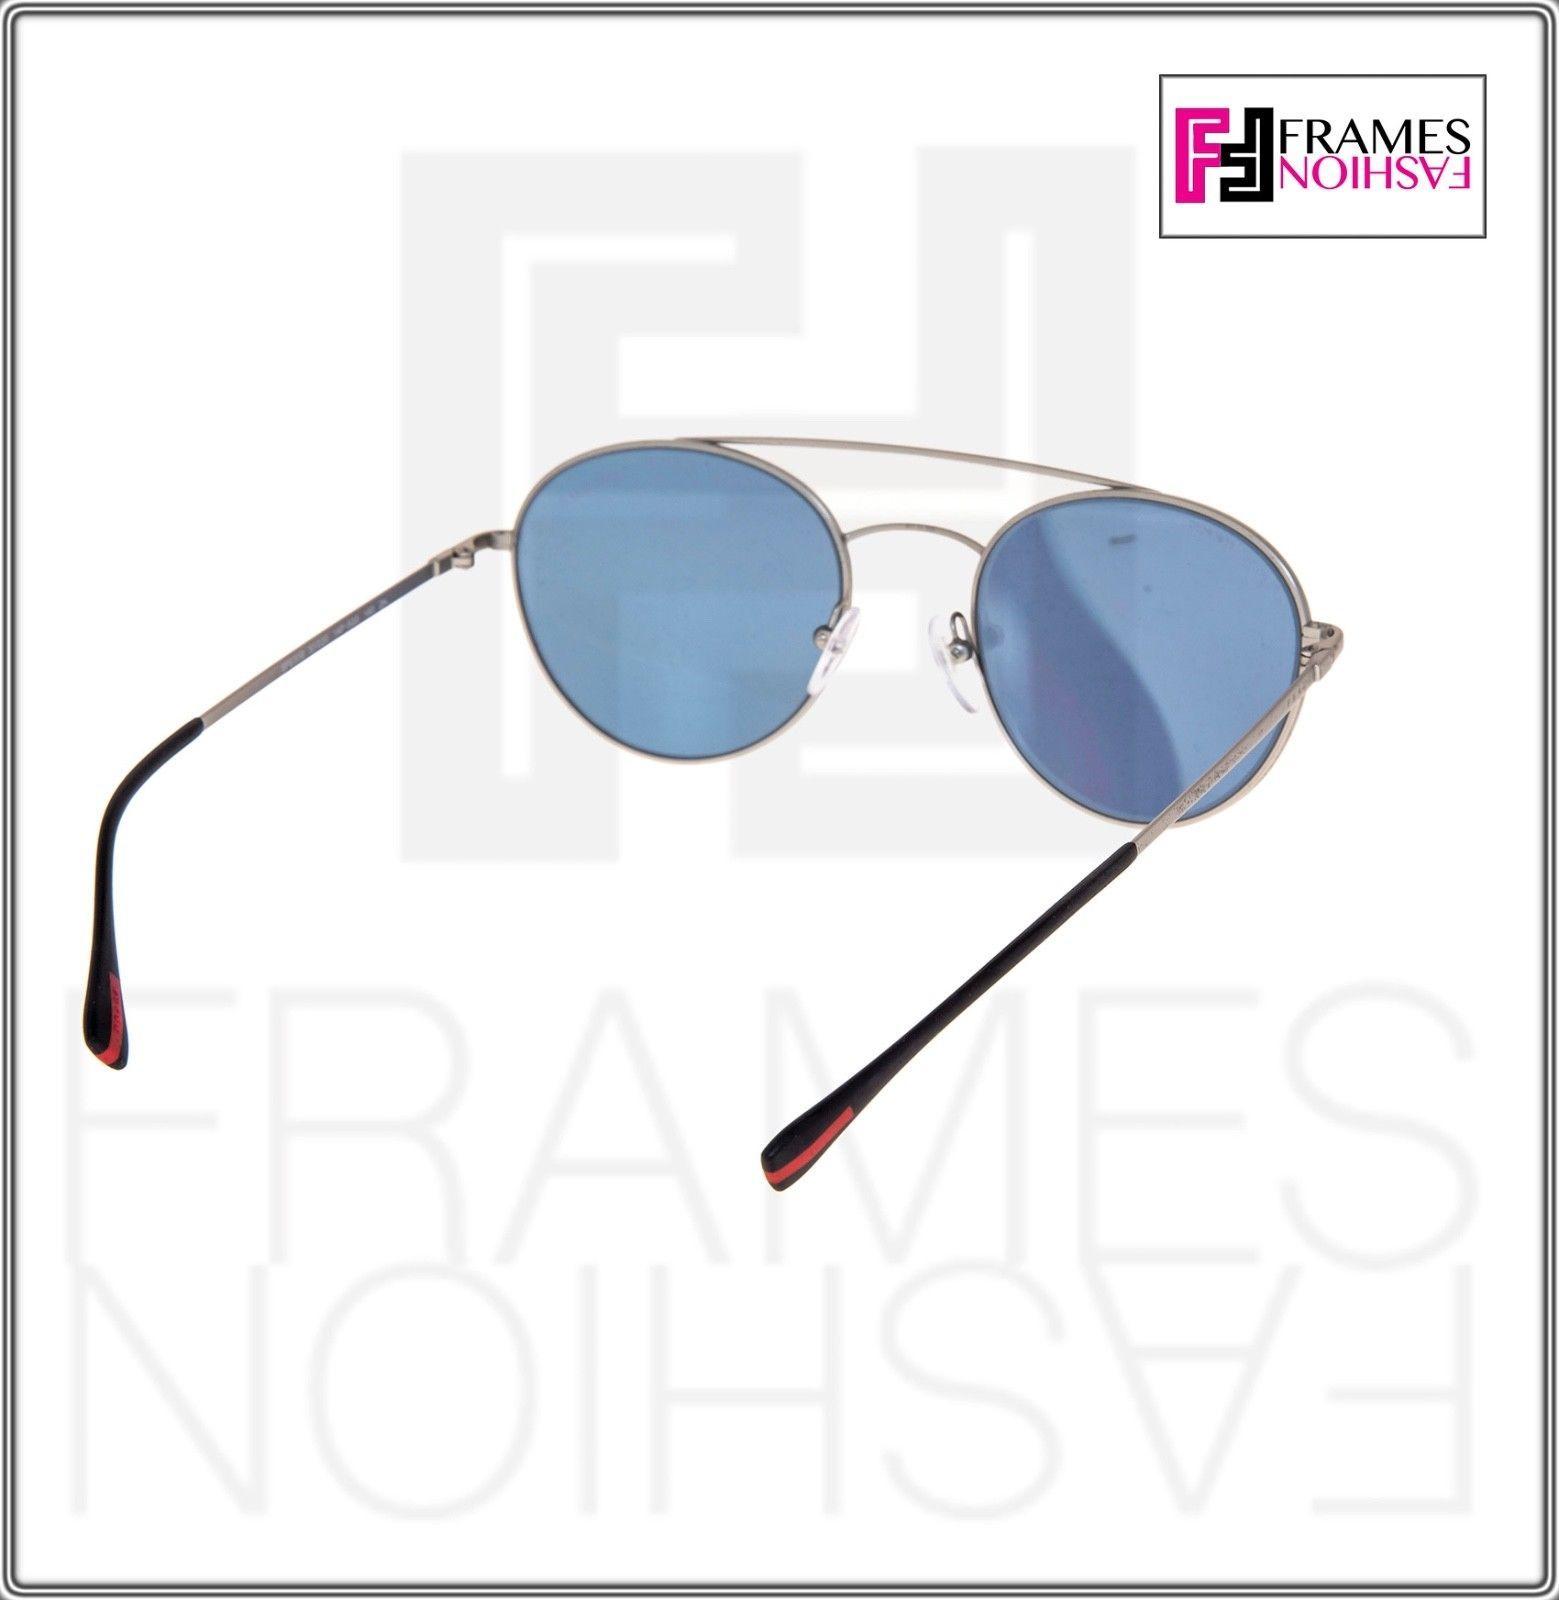 PRADA 51S Linea Rossa Spectrum Round Sunglasses Matte Silver Blue Mirrored PS51S